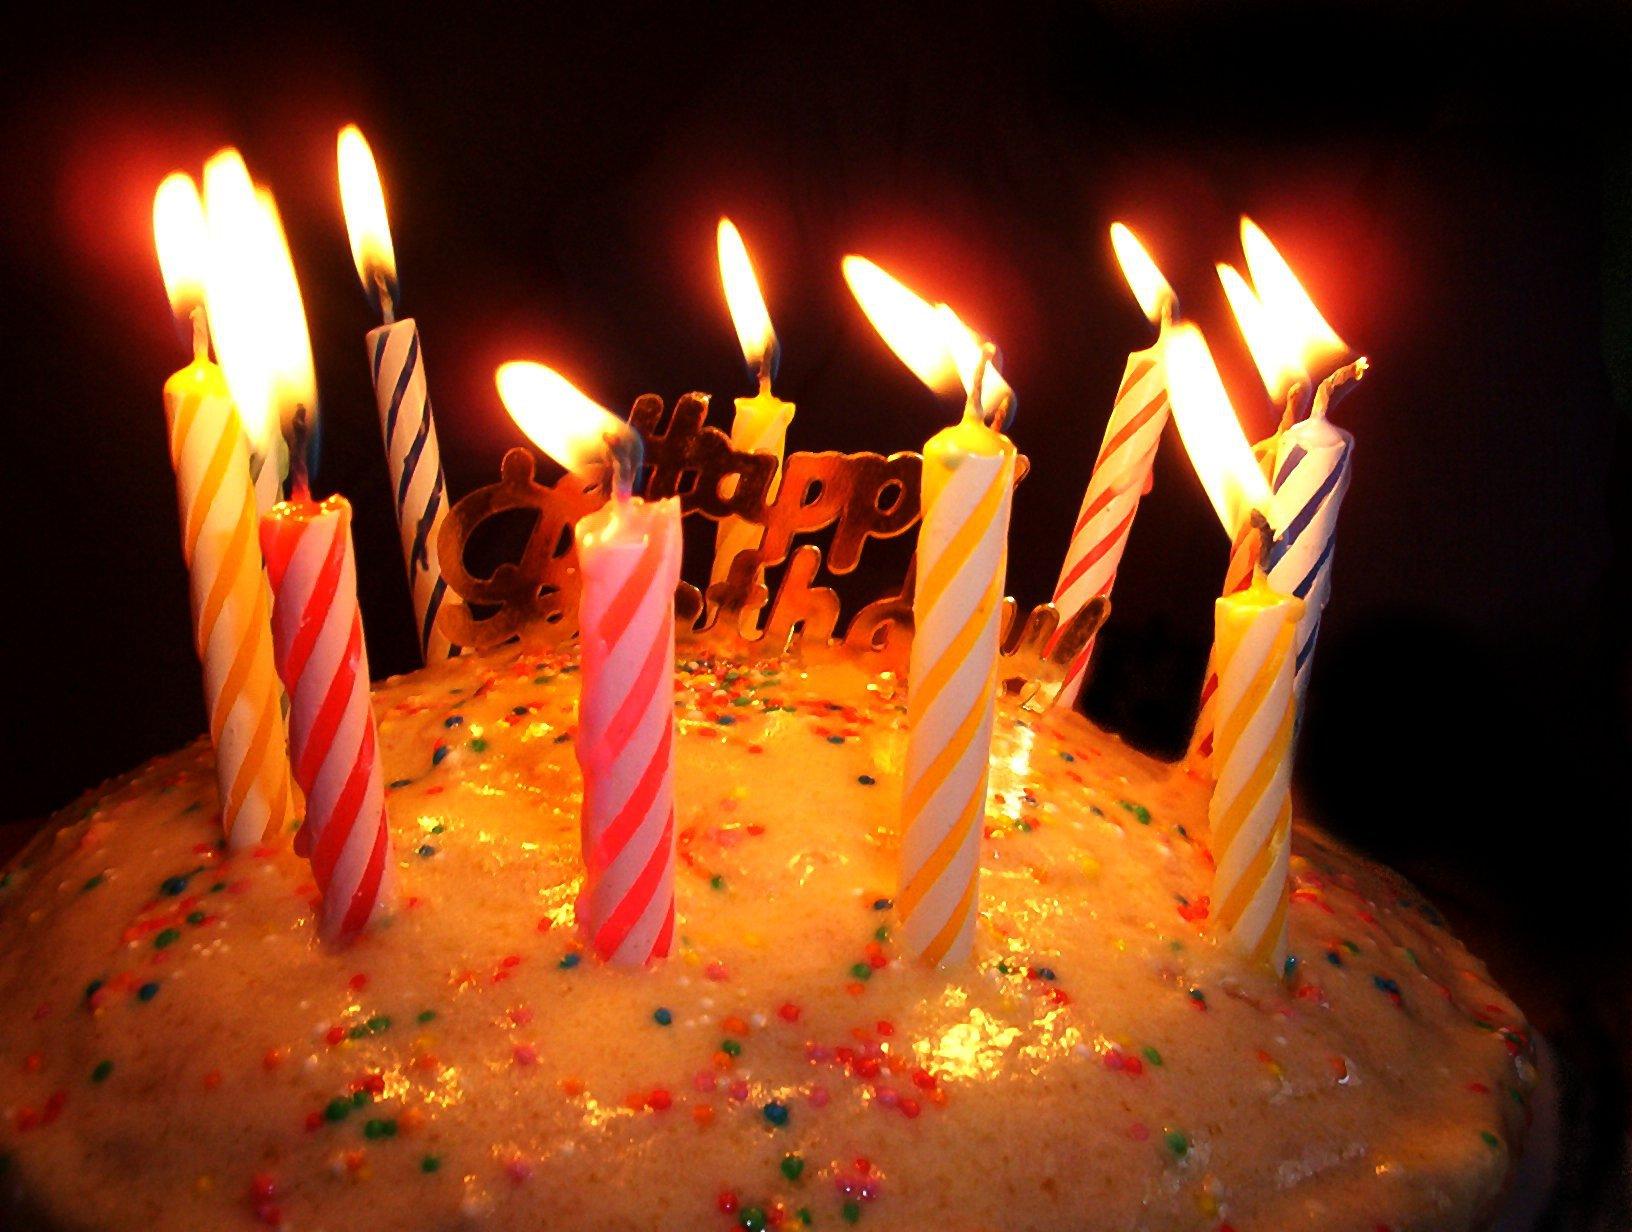 Big b birthday photos Miley Cyrus Goes to Town on Birthday Penis Cake m